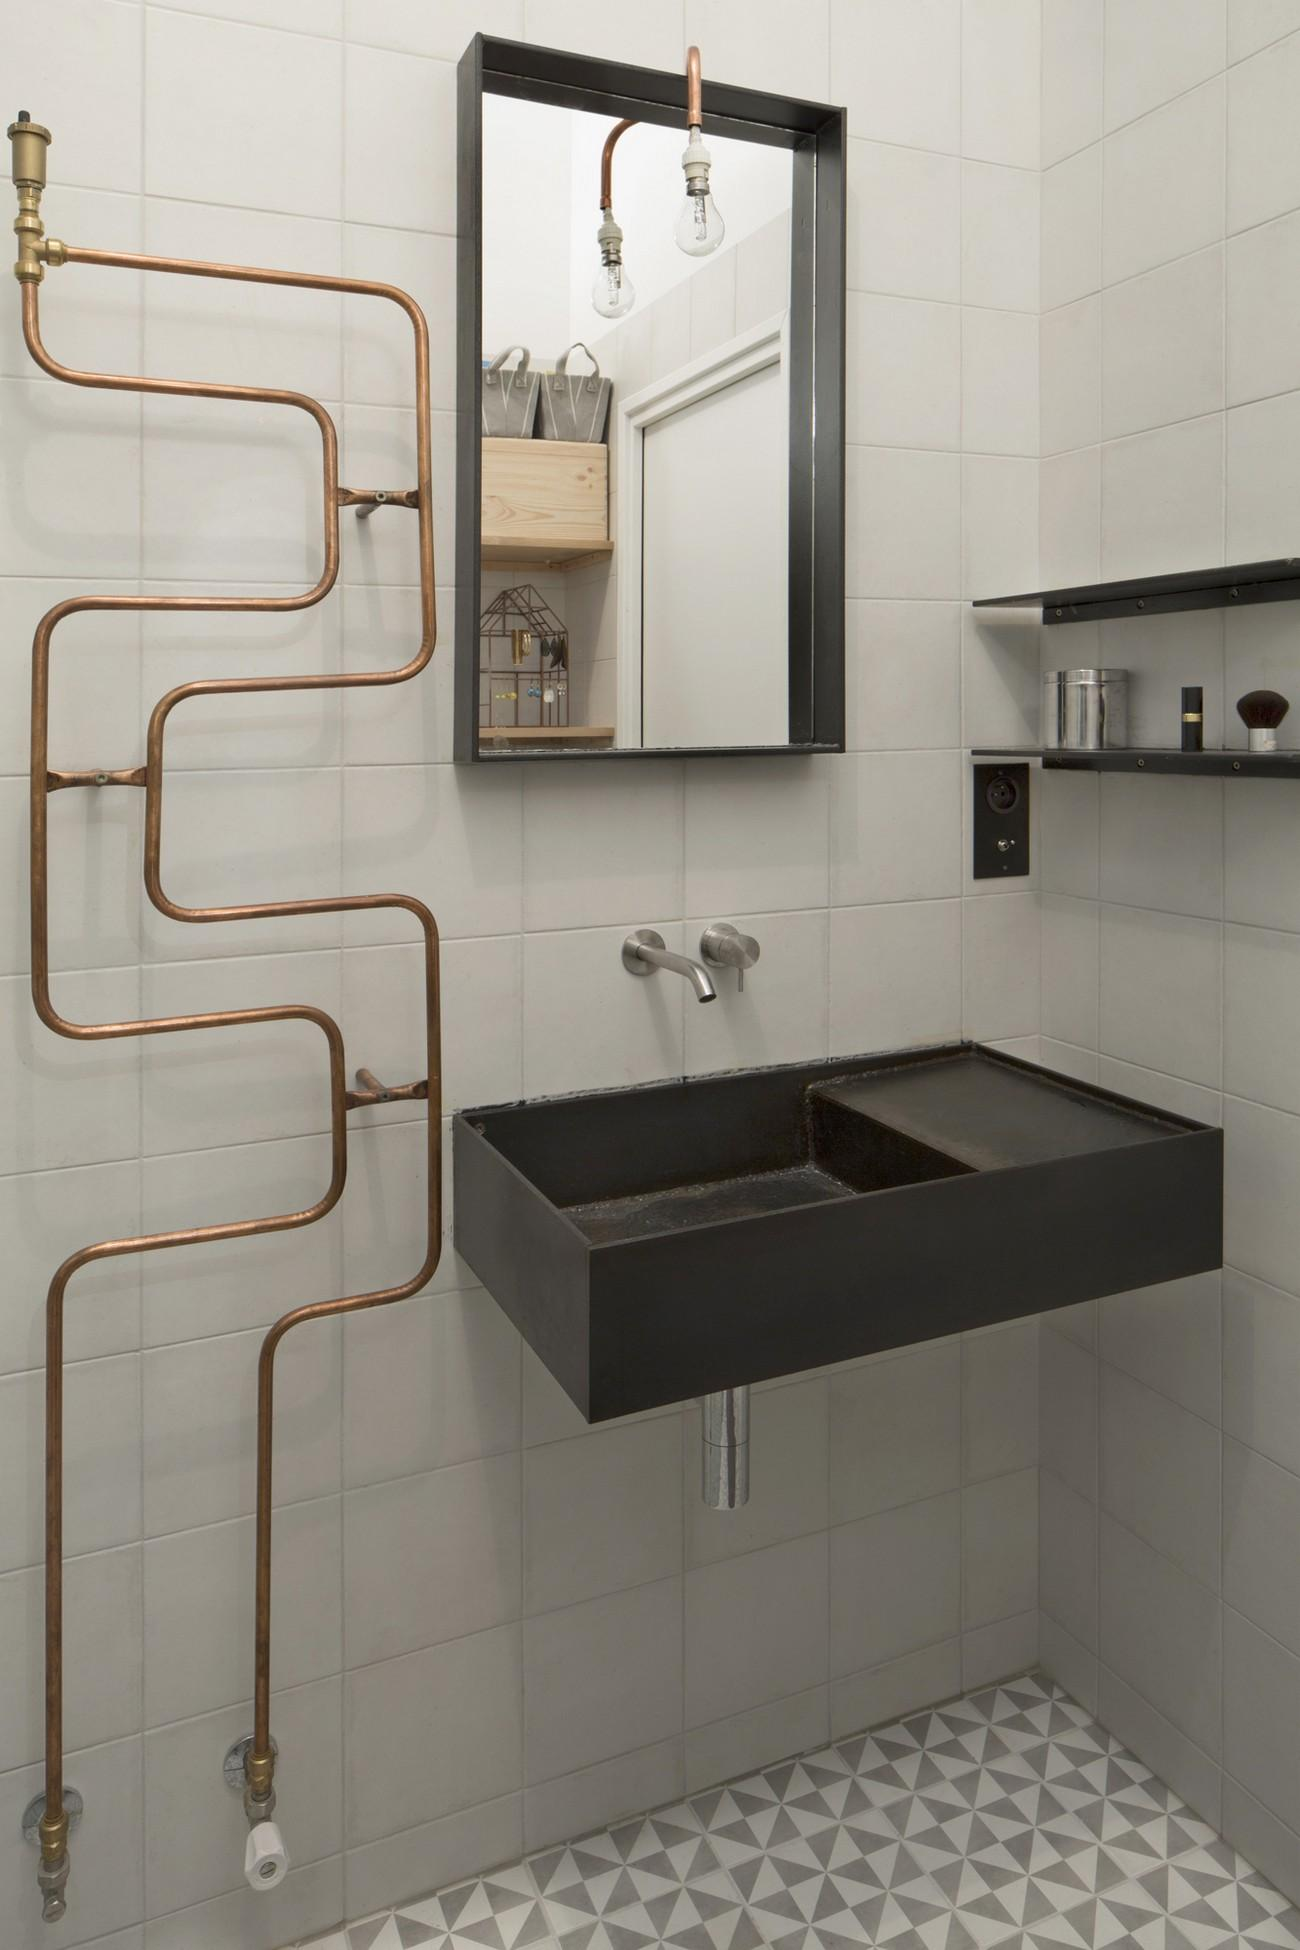 Exposed Copper Plumbing Bathroom